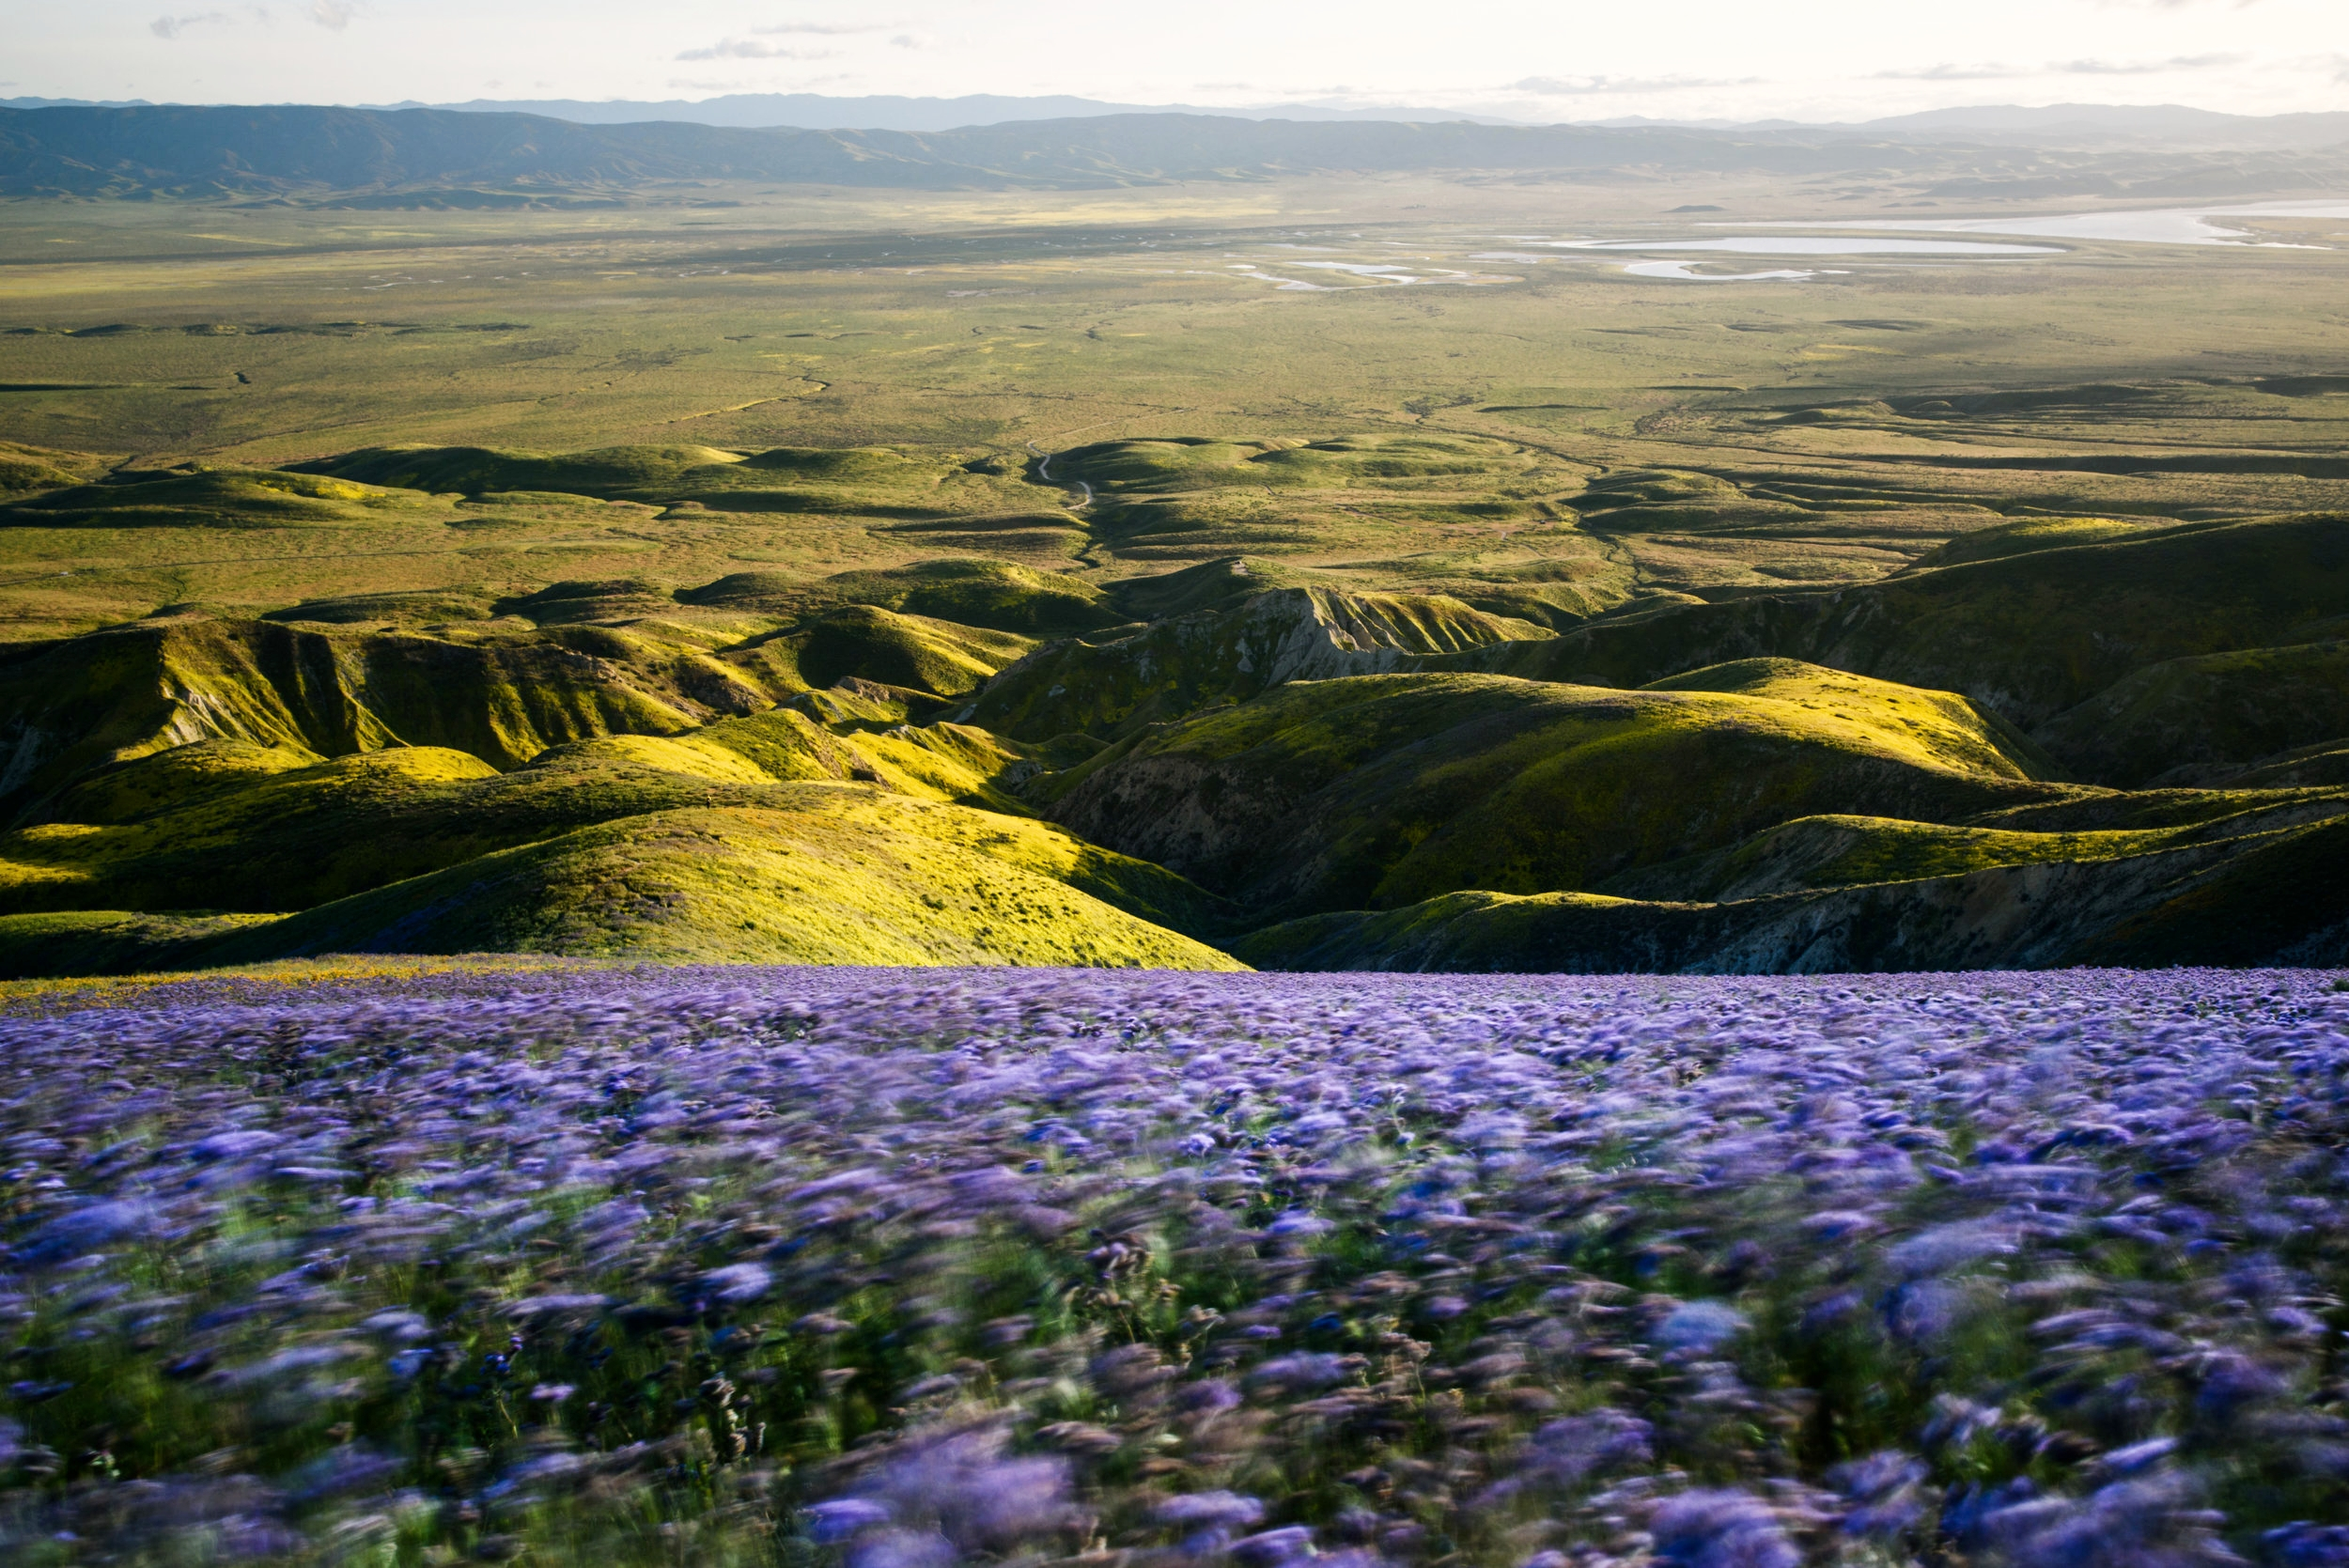 Long exposure of wildflowers on Carrizo Plain